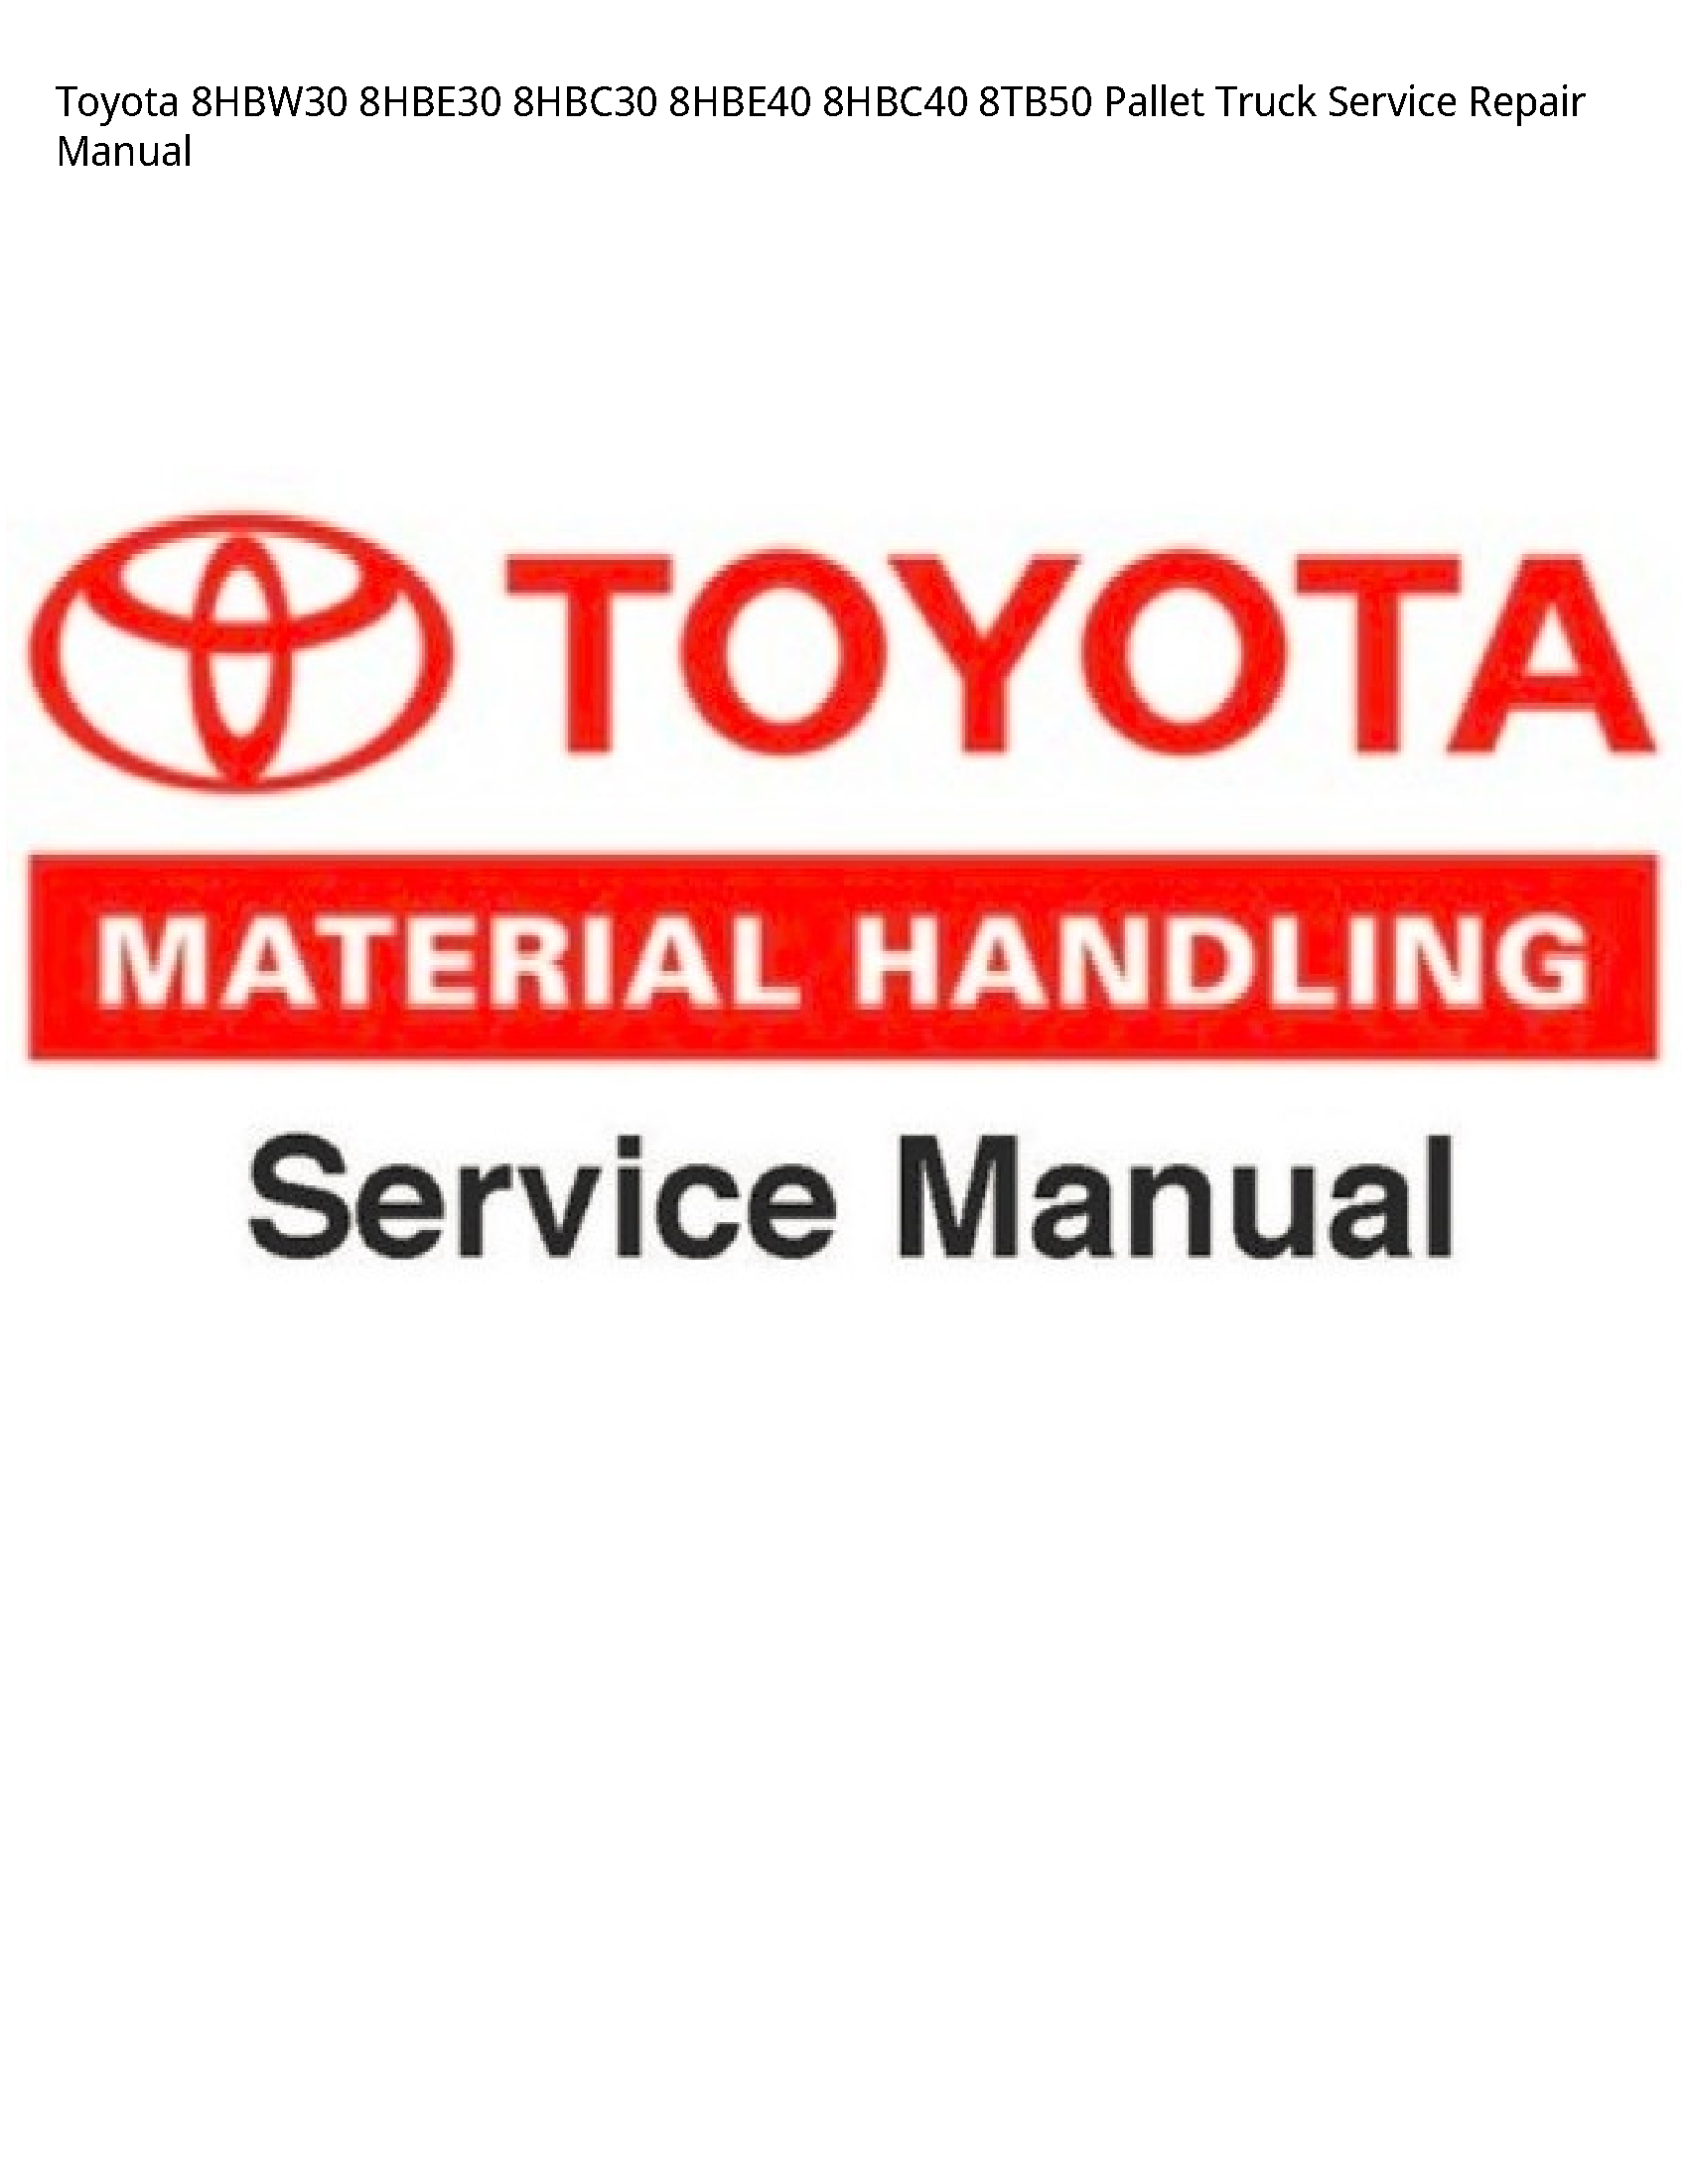 Toyota 8HBW30 Pallet Truck manual